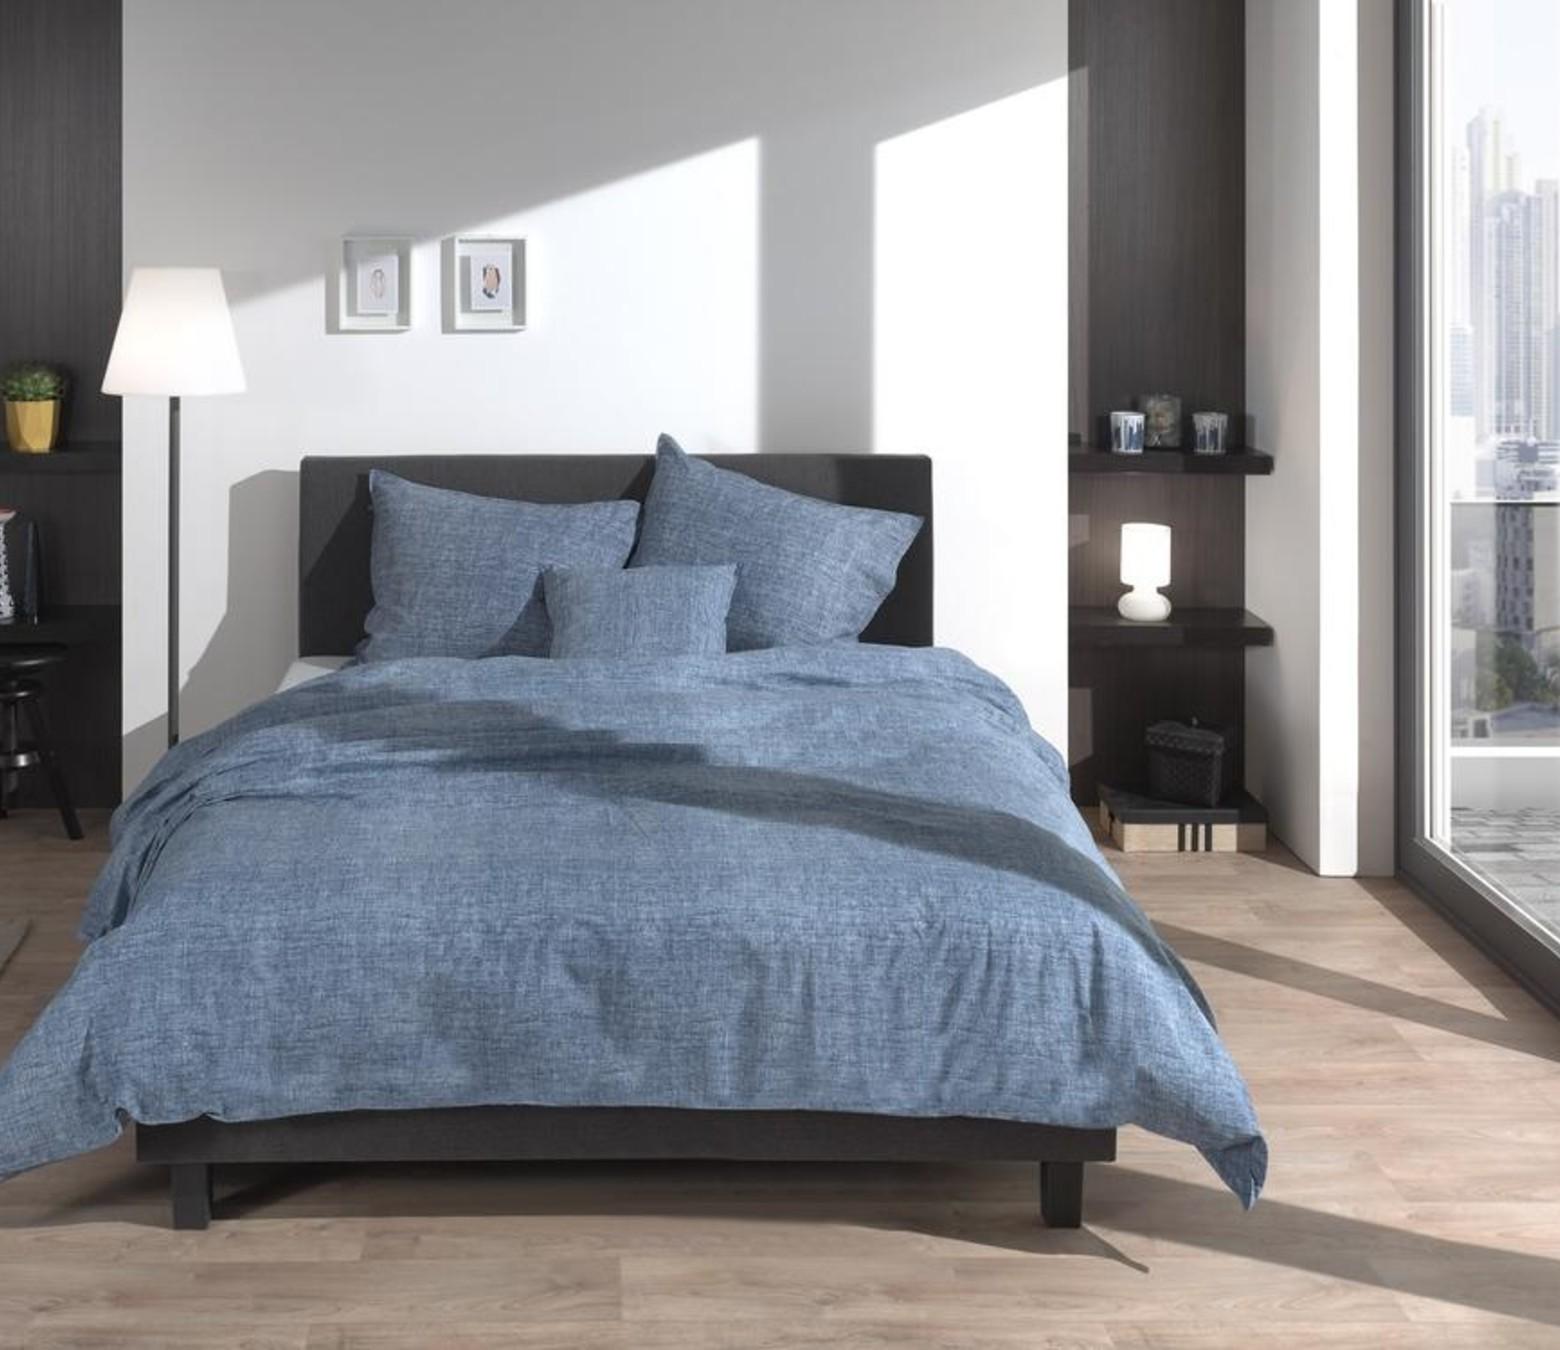 Dekbedovertrek Lino Urban Blue - 100% Katoen